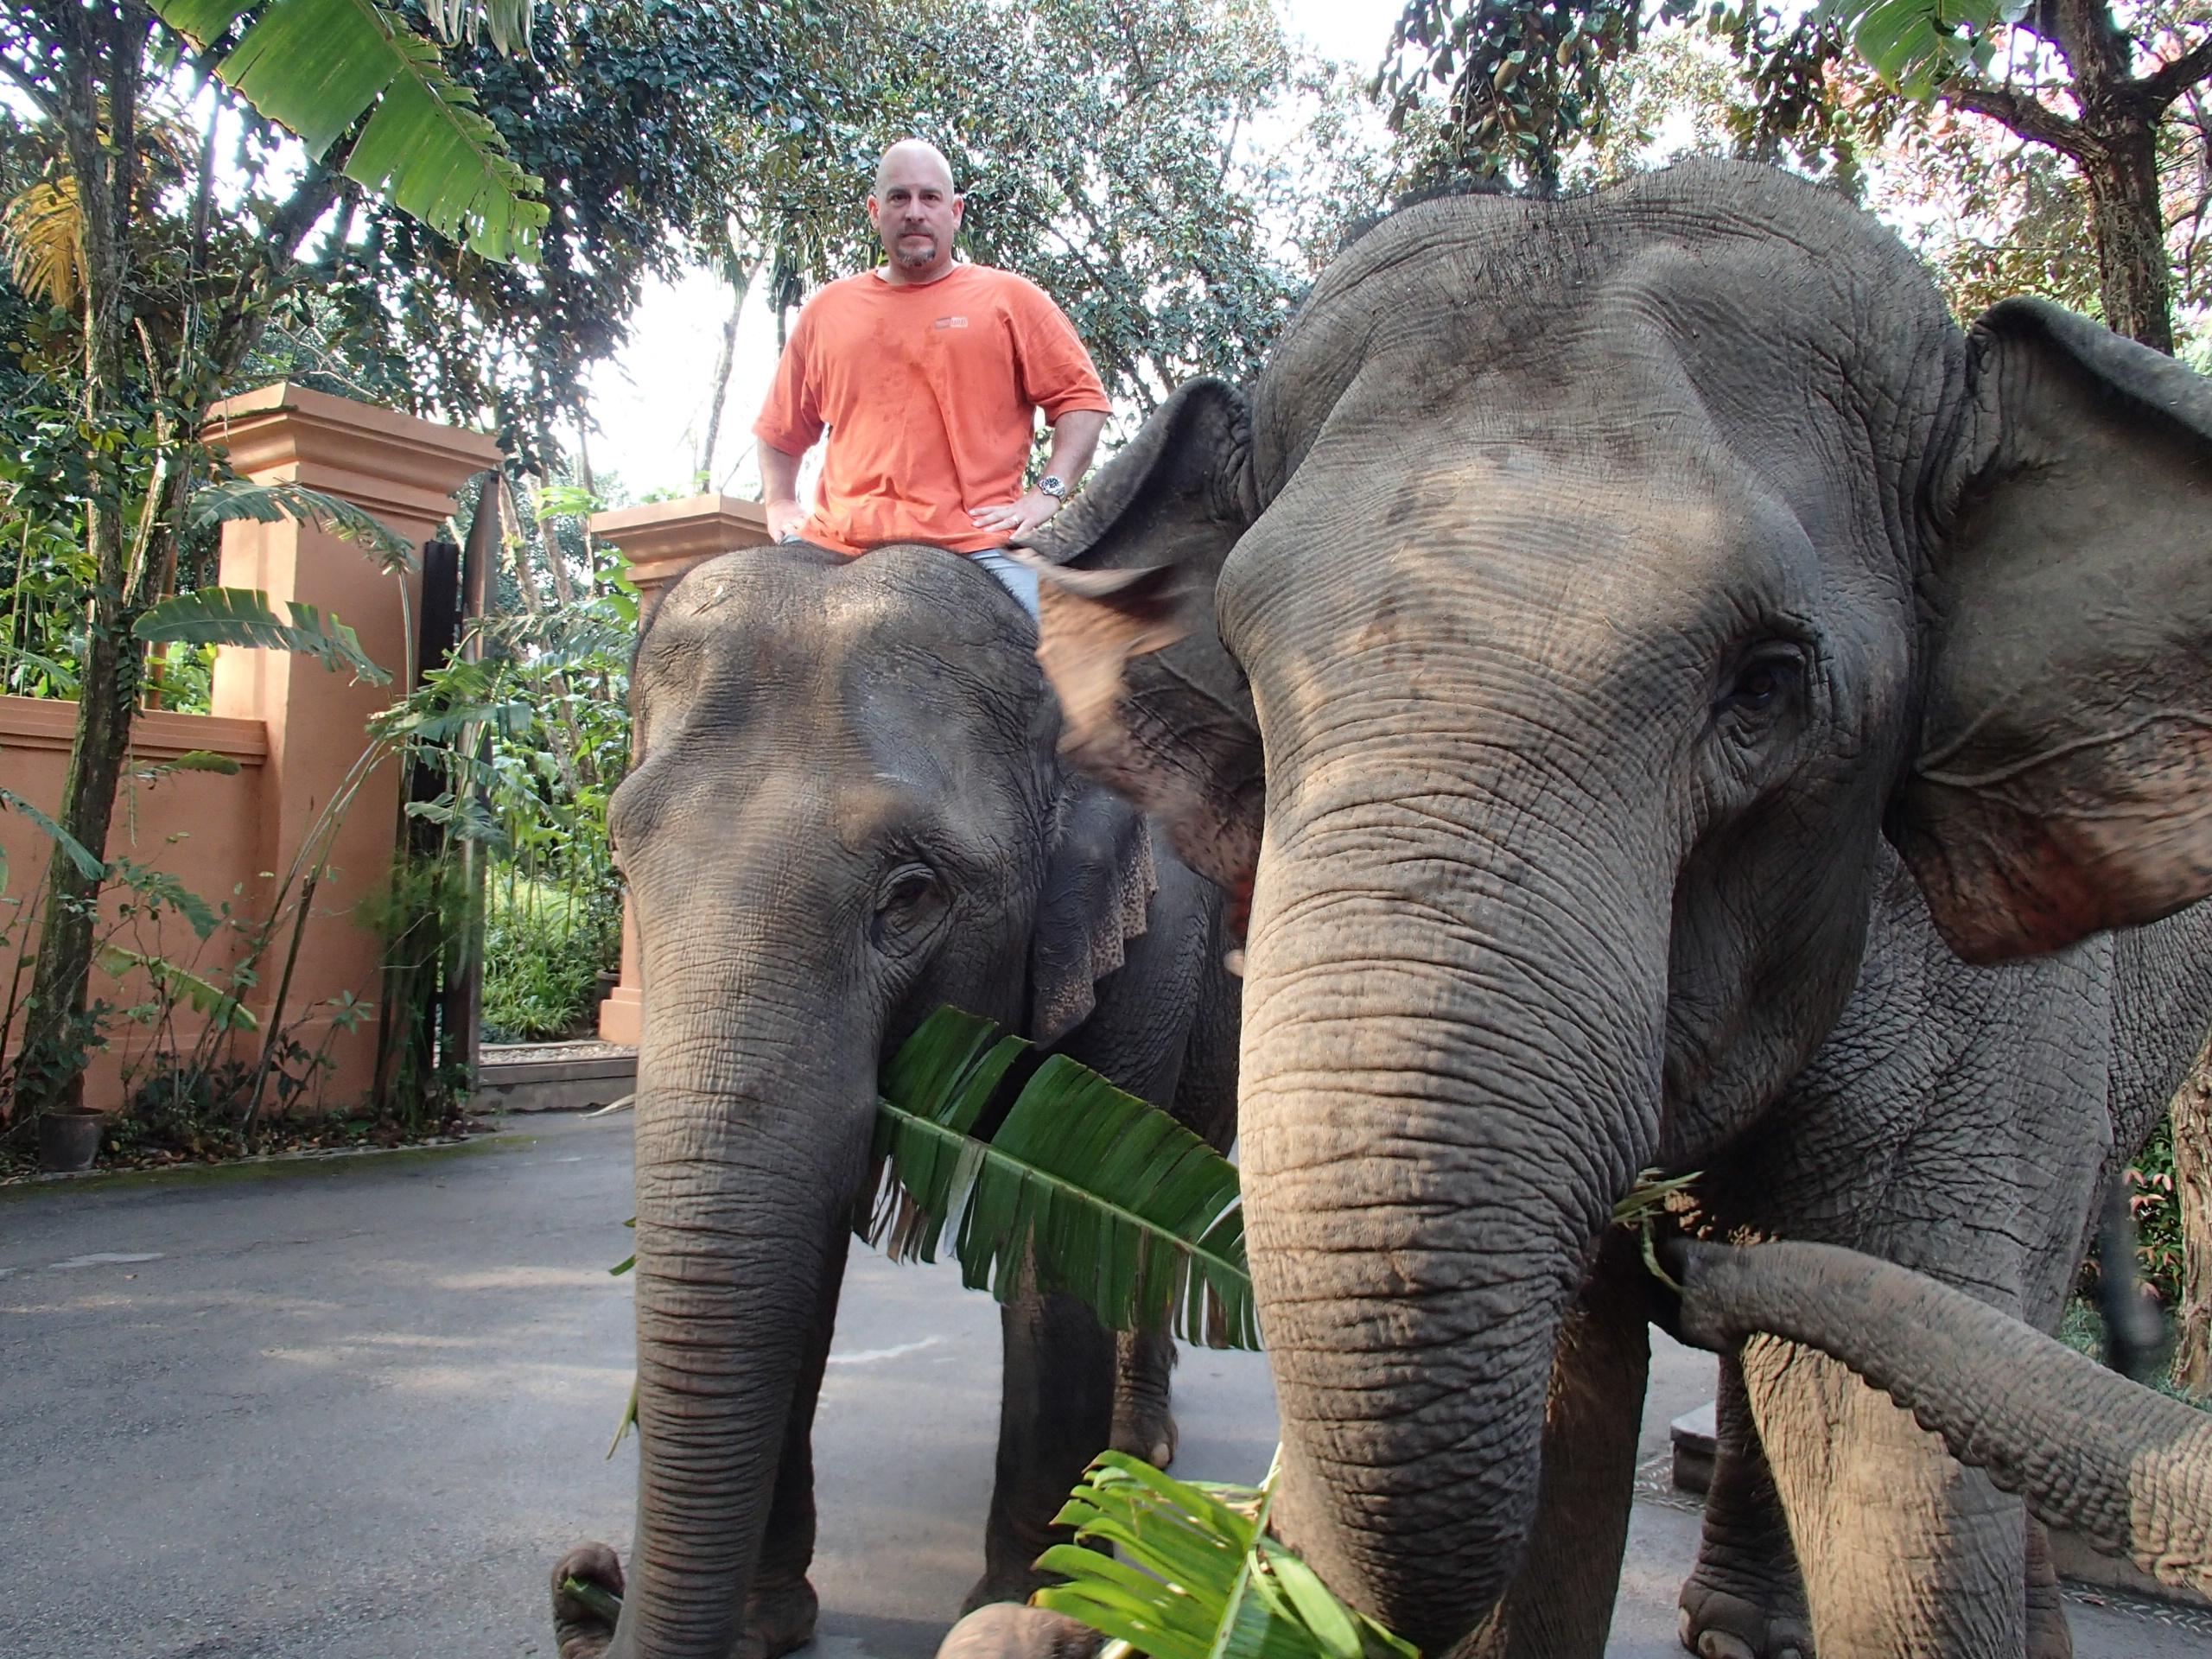 Michael & elephants at Anantara Golden Triangle